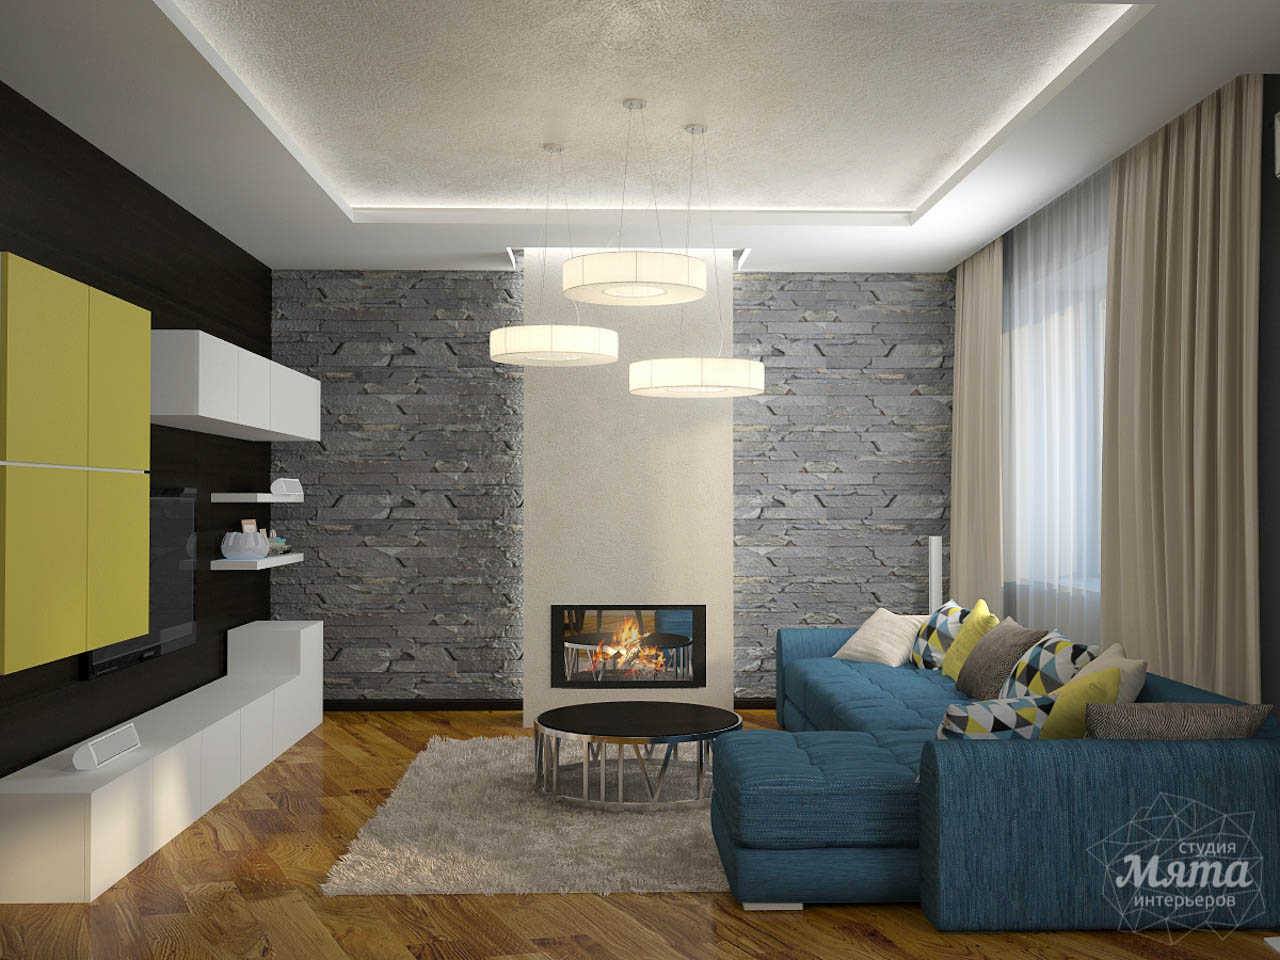 Дизайн проект интерьера коттеджа  в стиле минимализм по ул. Барвинка 15 img377043648